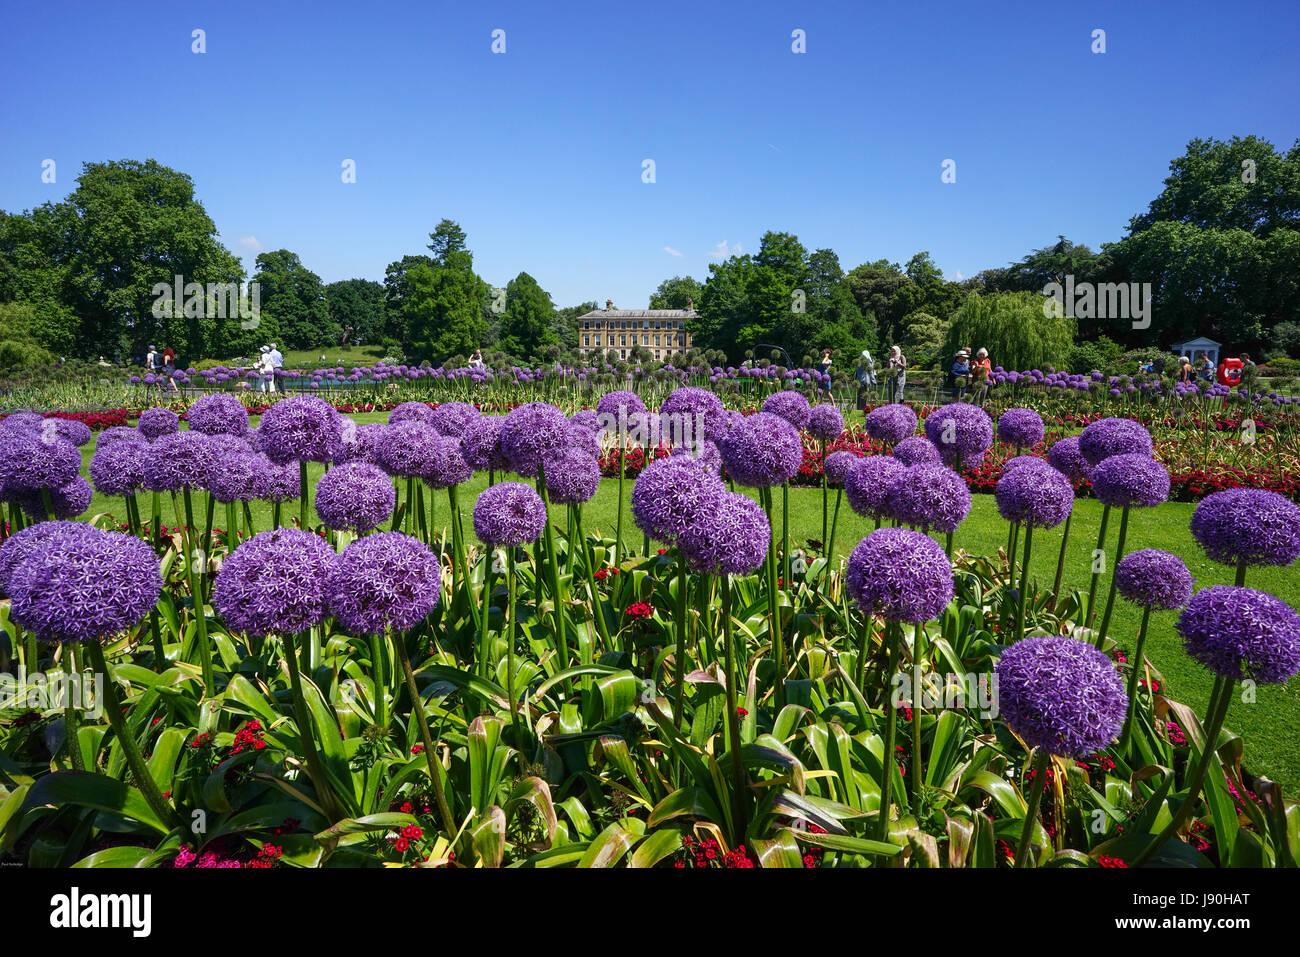 Alliums in Kew Gardens London Richmond, England. - Stock Image